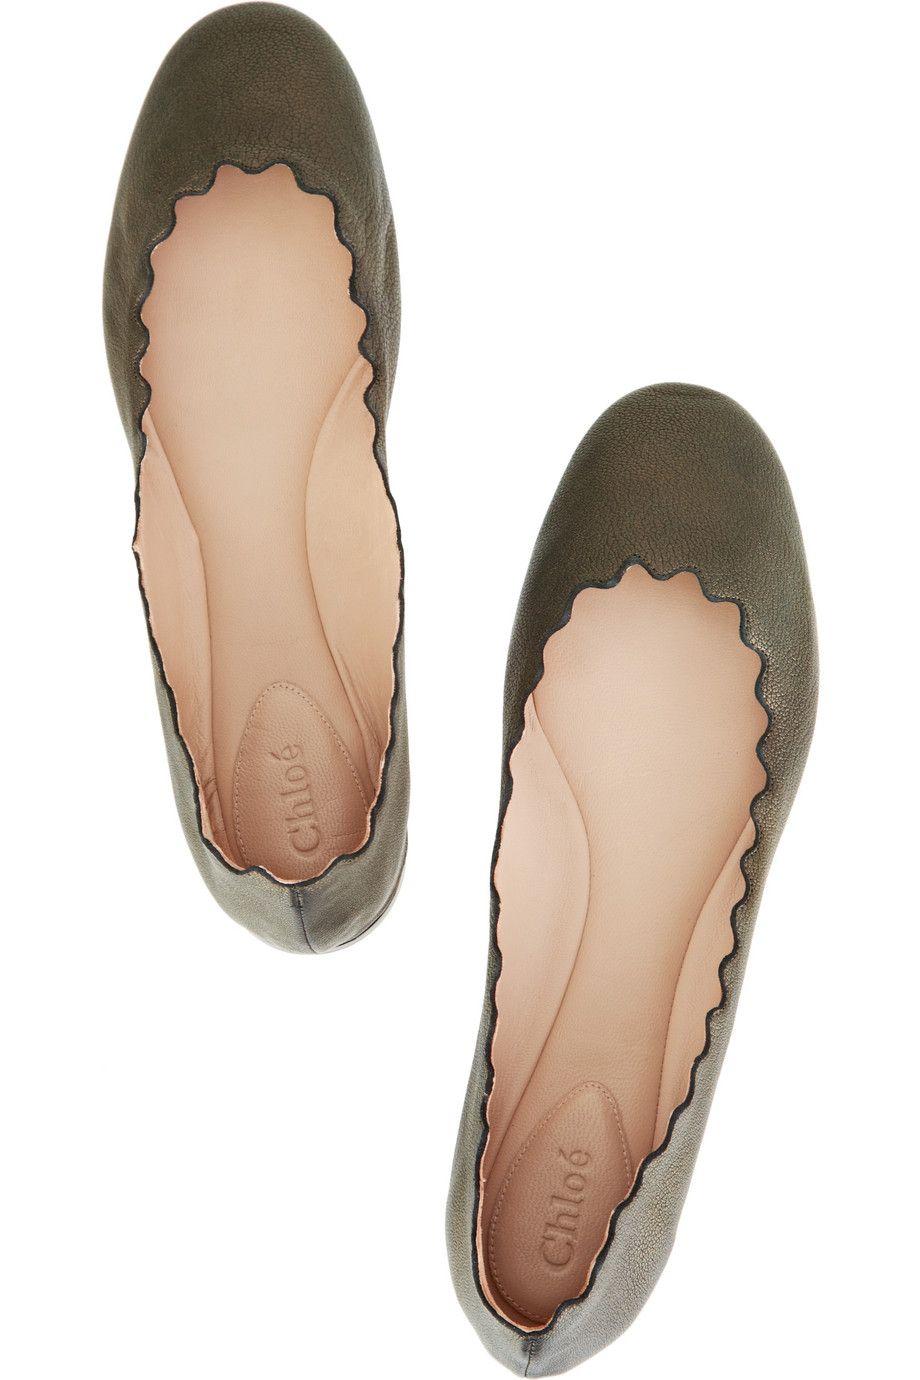 Heaven must be Chloe shoes